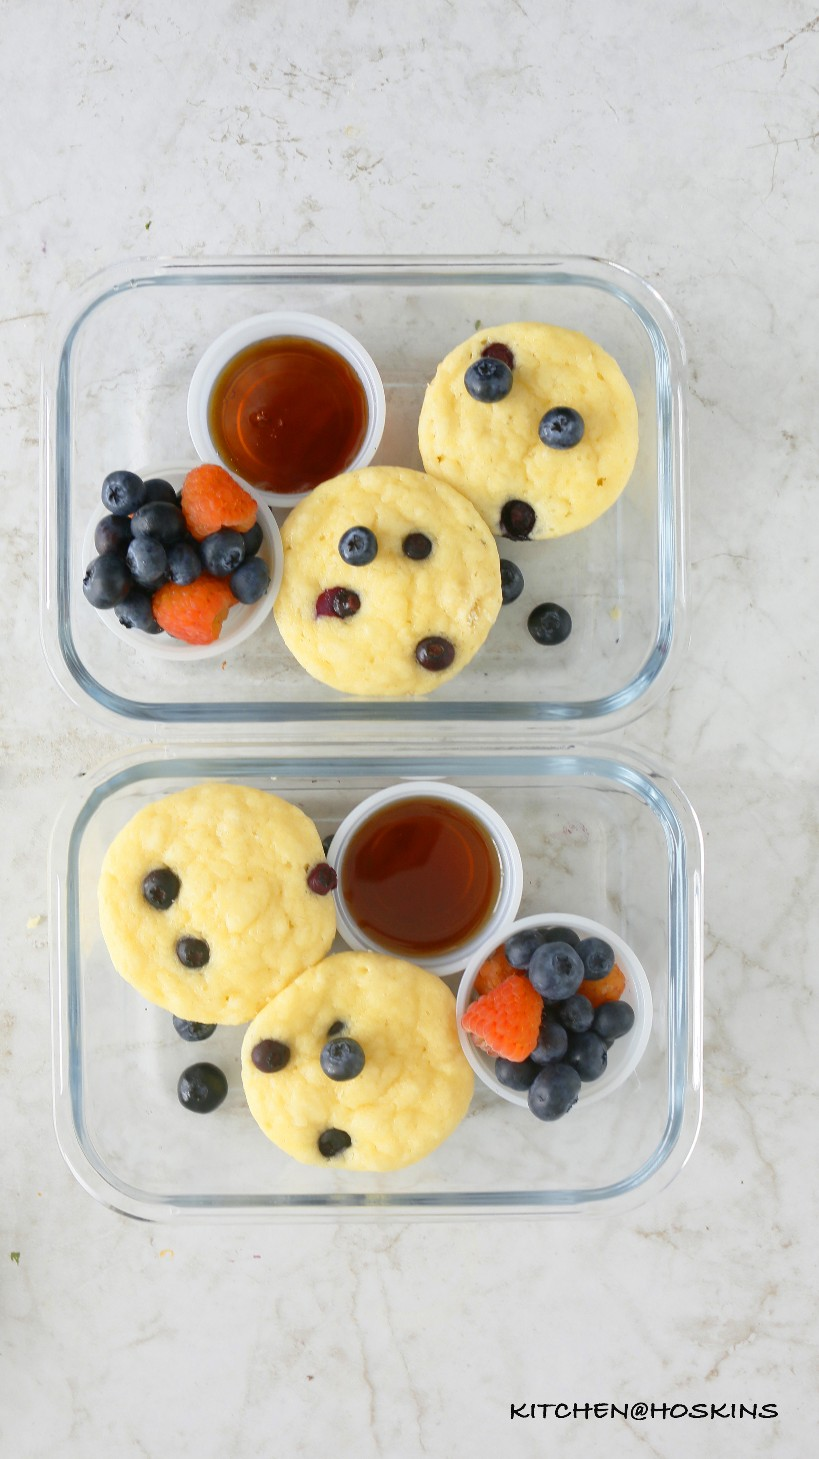 esponjosos panqueques de arándanos en un molde para muffins